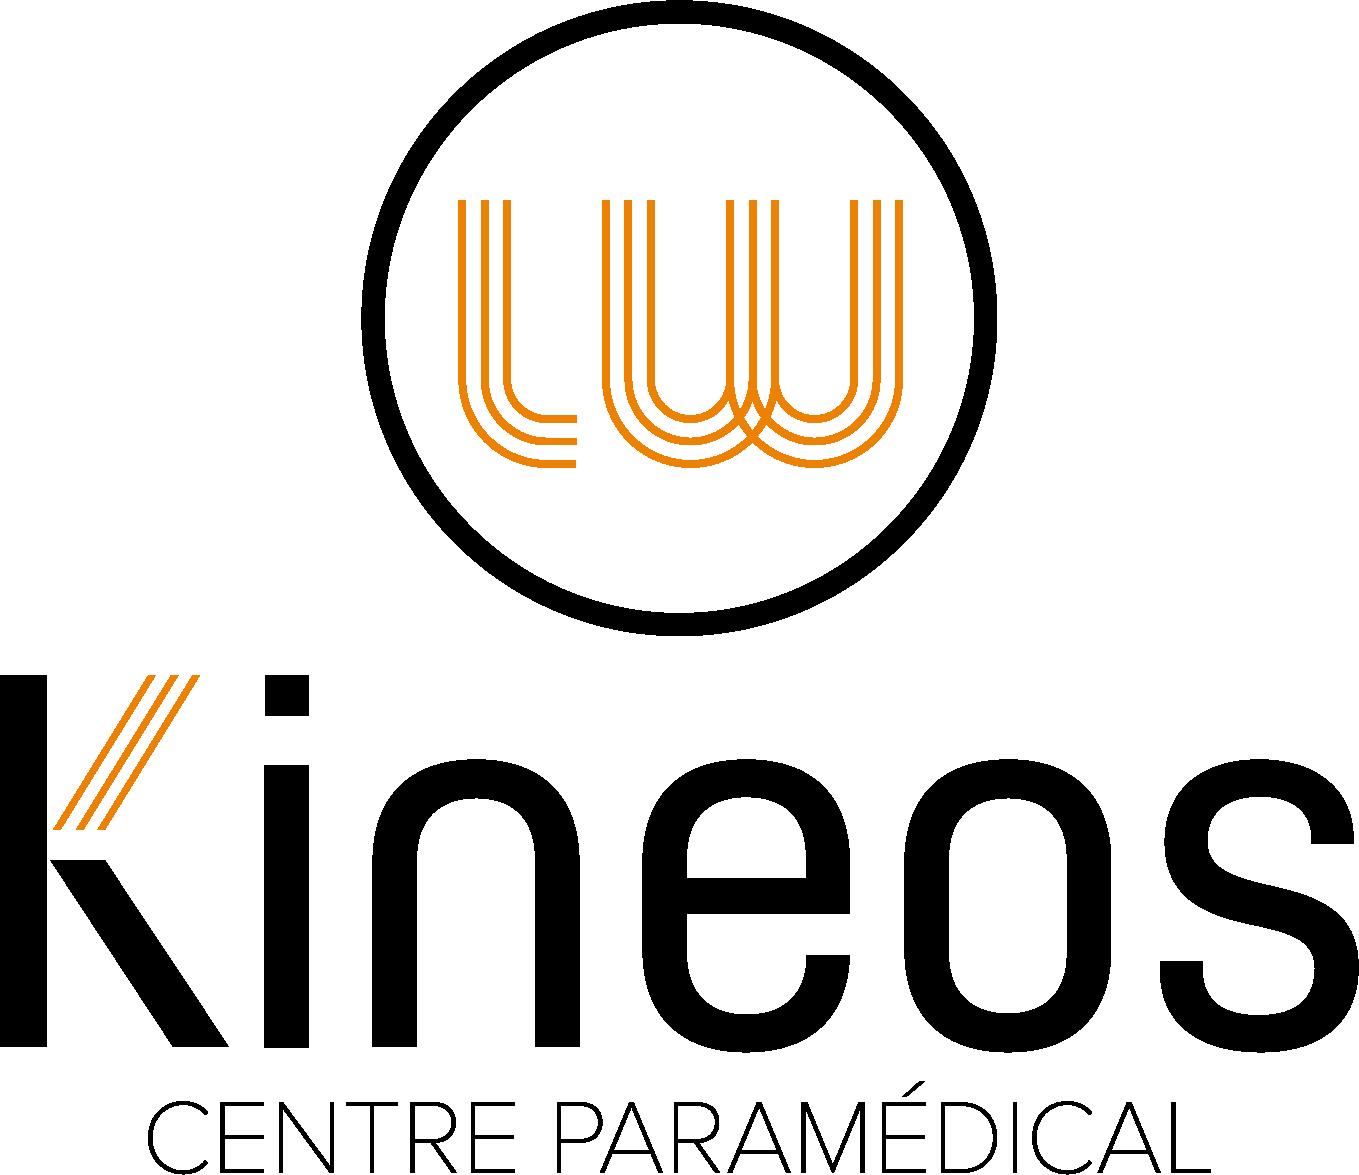 Centre Kinéos LW